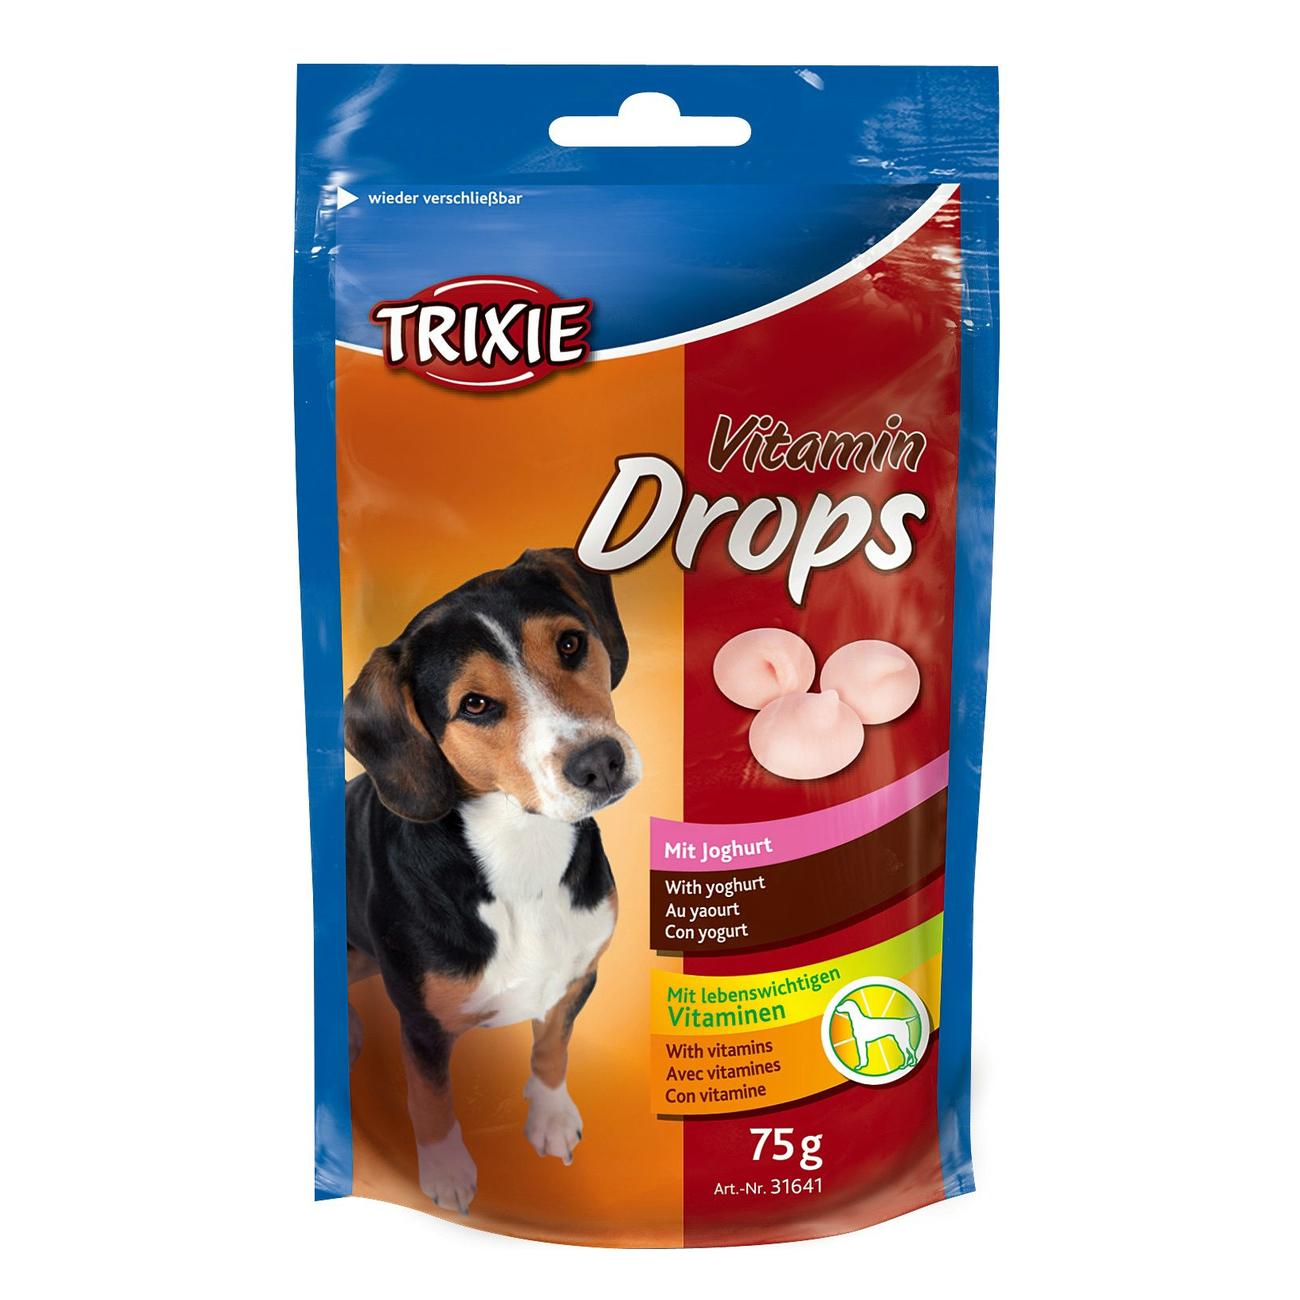 Trixie Hunde Vitamin-Drops mit Joghurt 31641